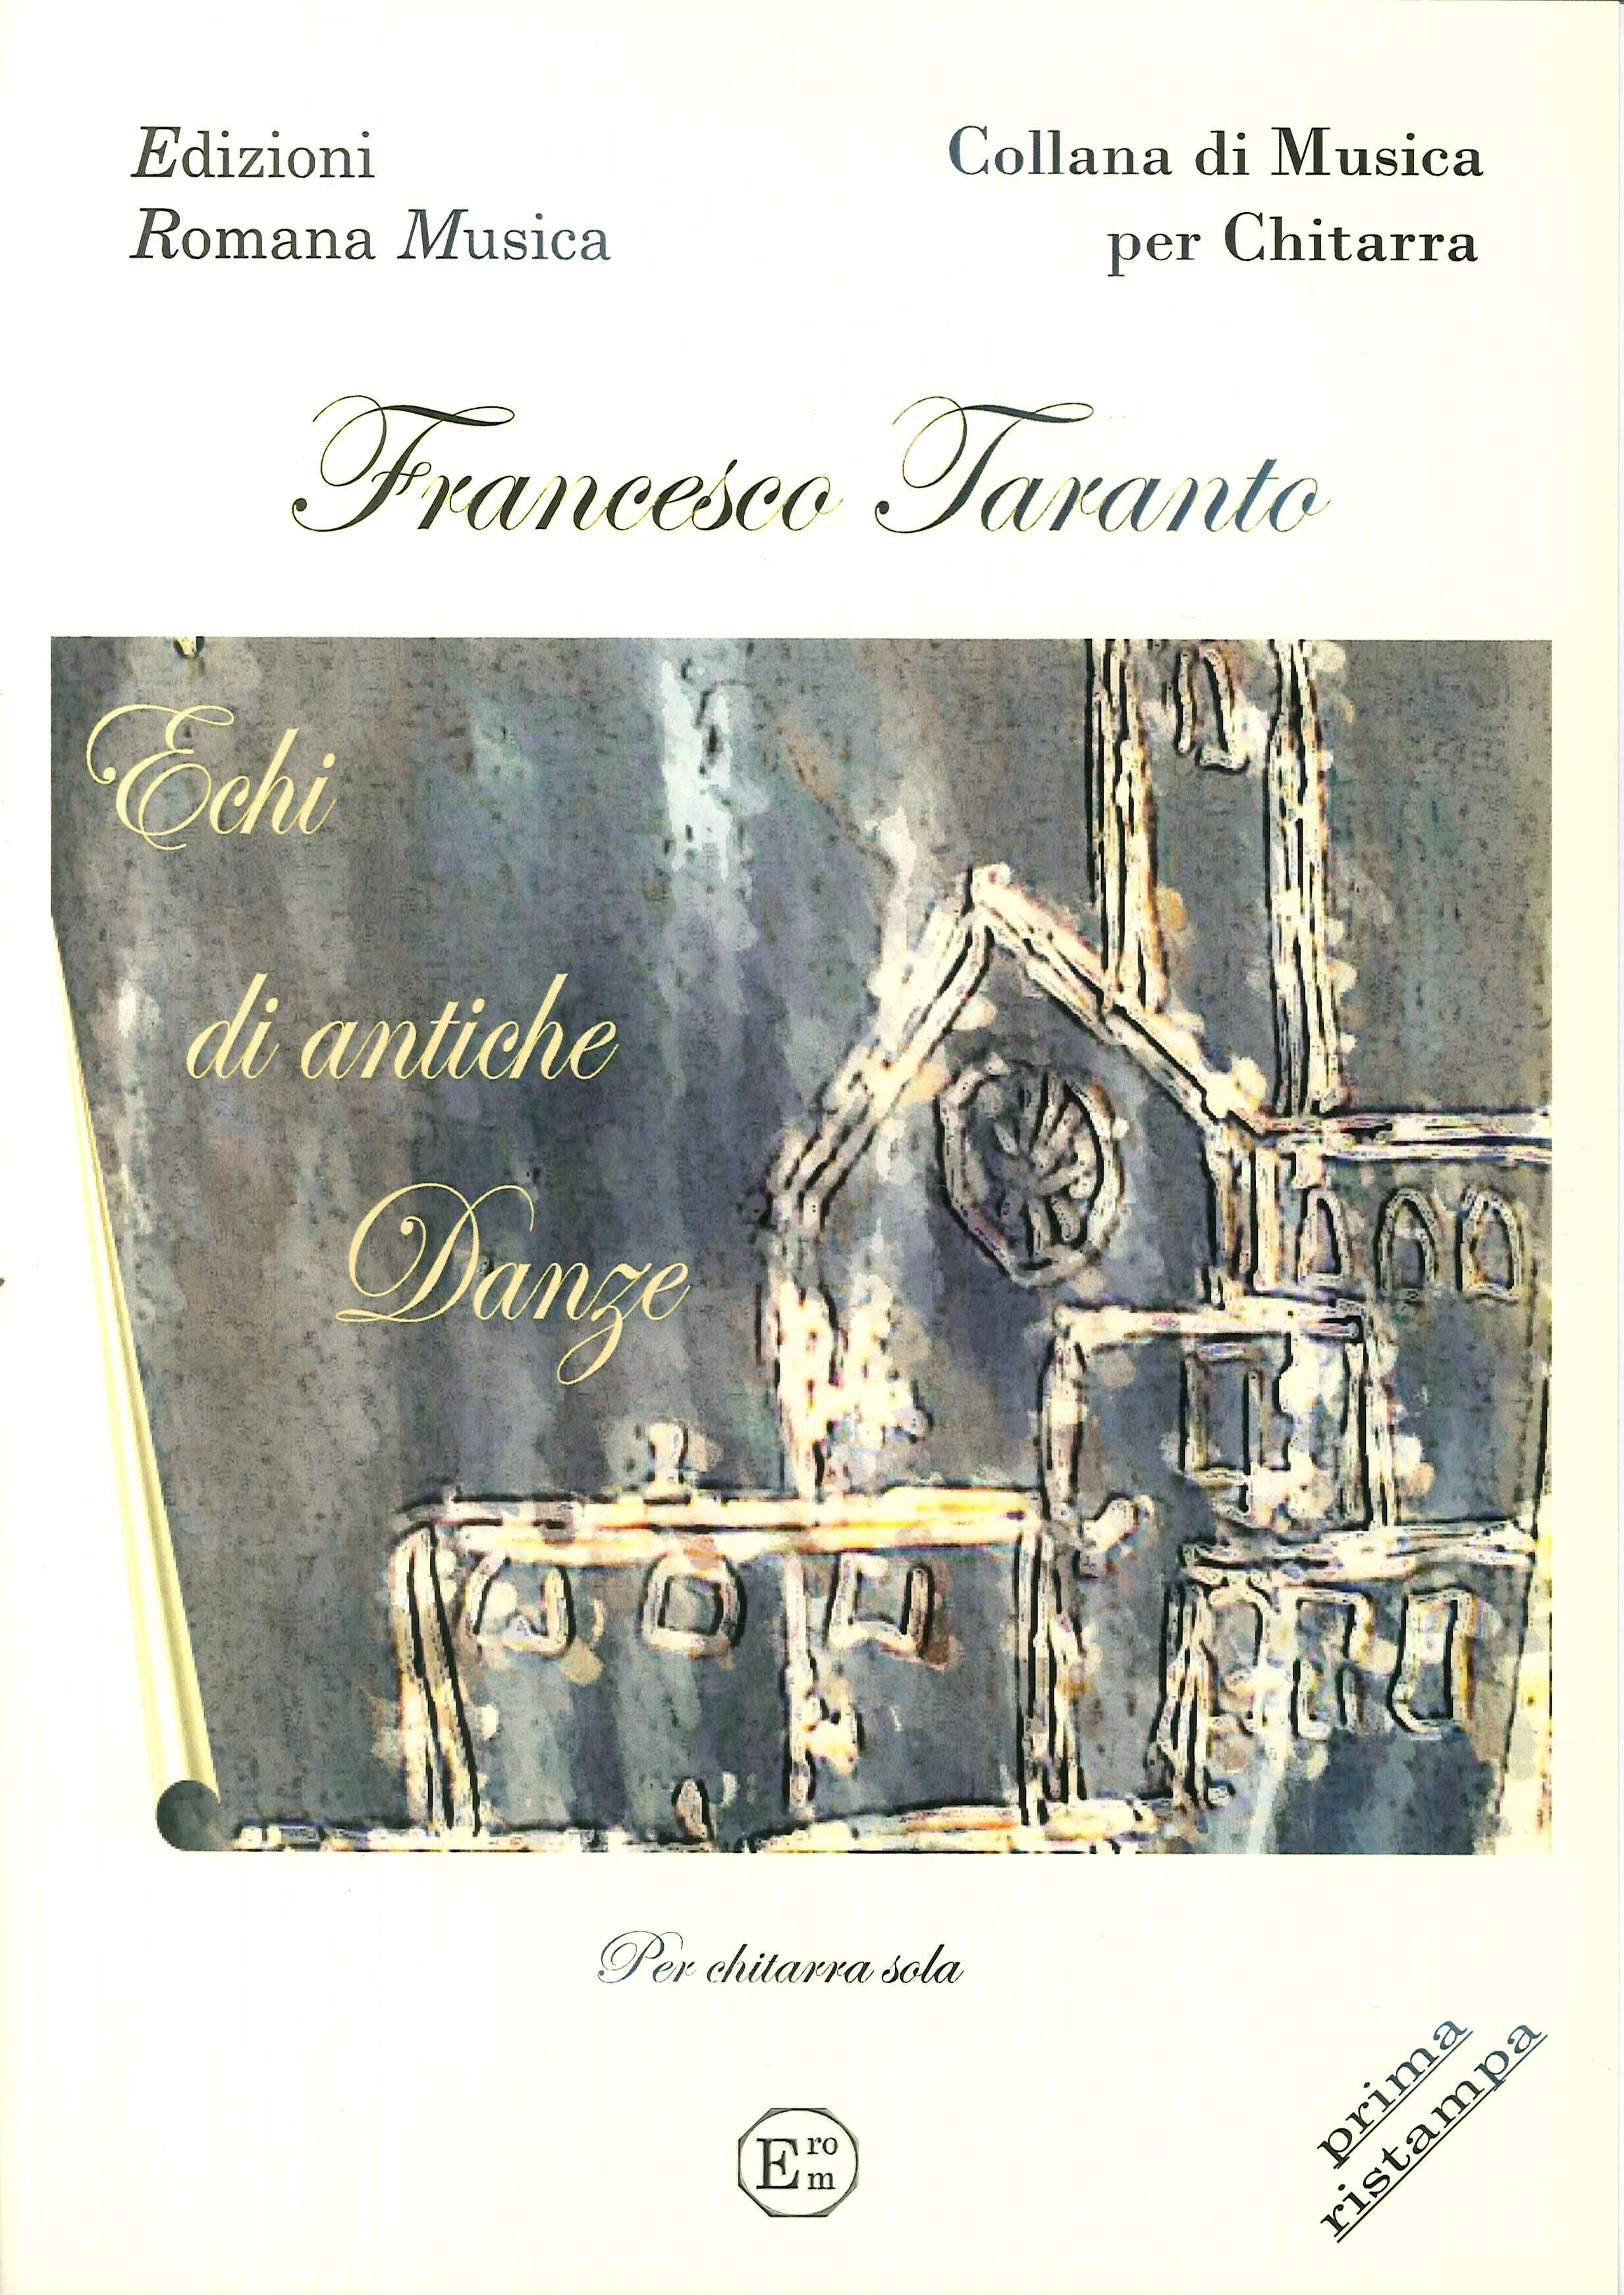 Francesco Taranto. Echi di Antiche Danze. Musica per Chitarra. Erom 0028.